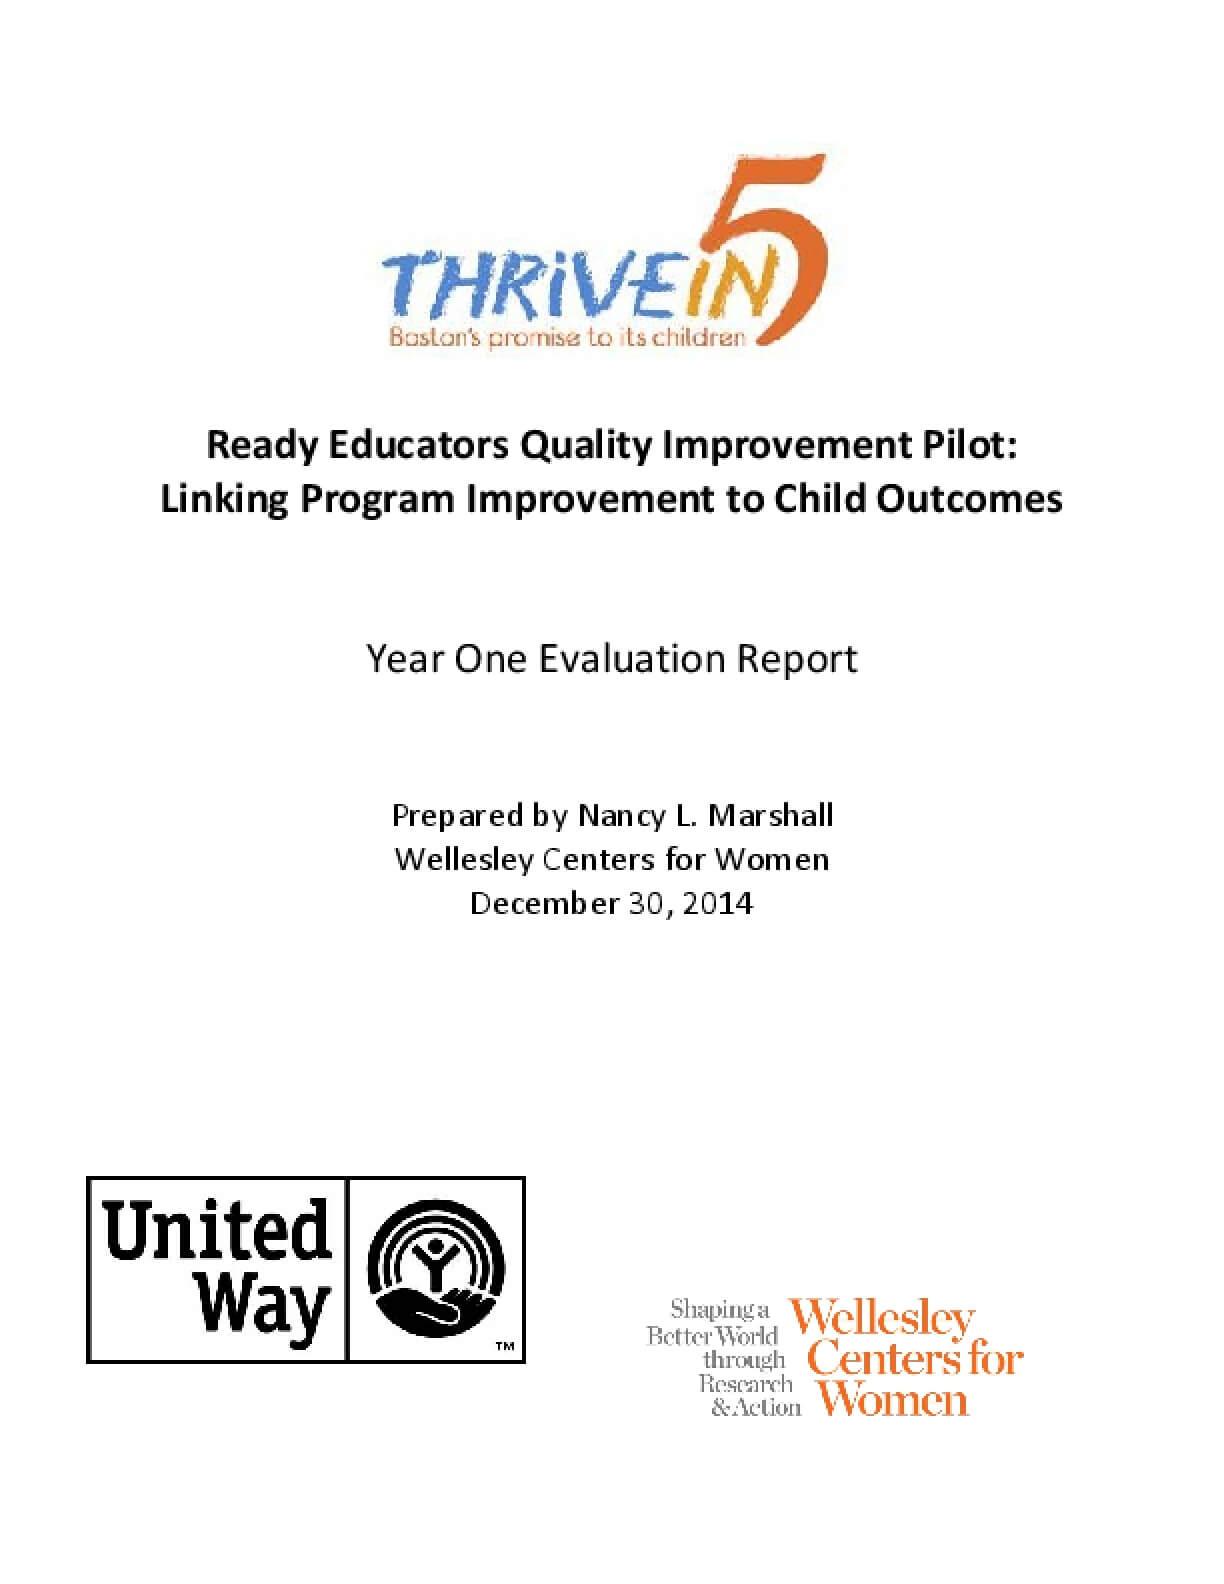 Ready Educators Quality Improvement Pilot: Linking Program Improvement to Child Outcomes